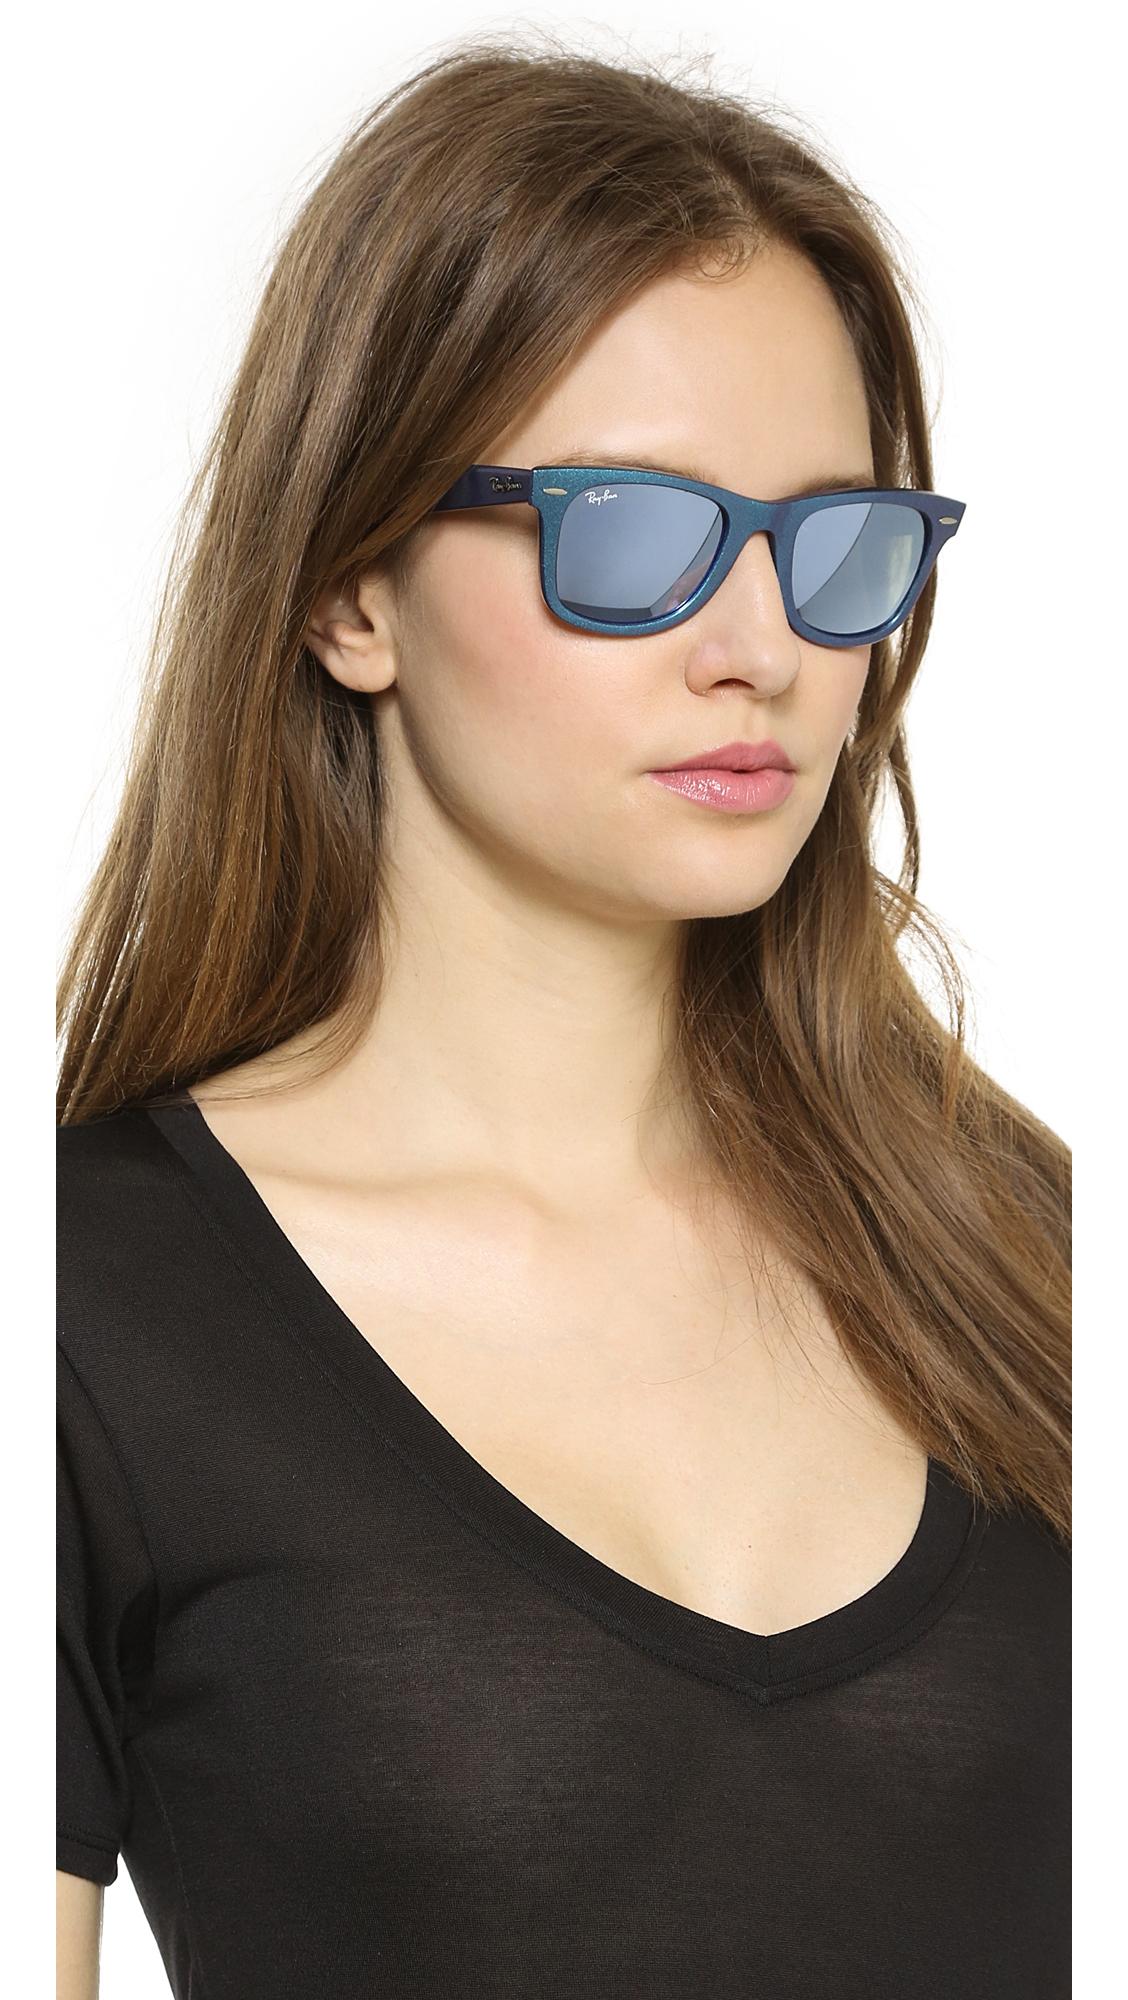 daf262360f7 Ray-Ban Cosmo Saturn Sunglasses - Metallic Pink in Blue - Lyst